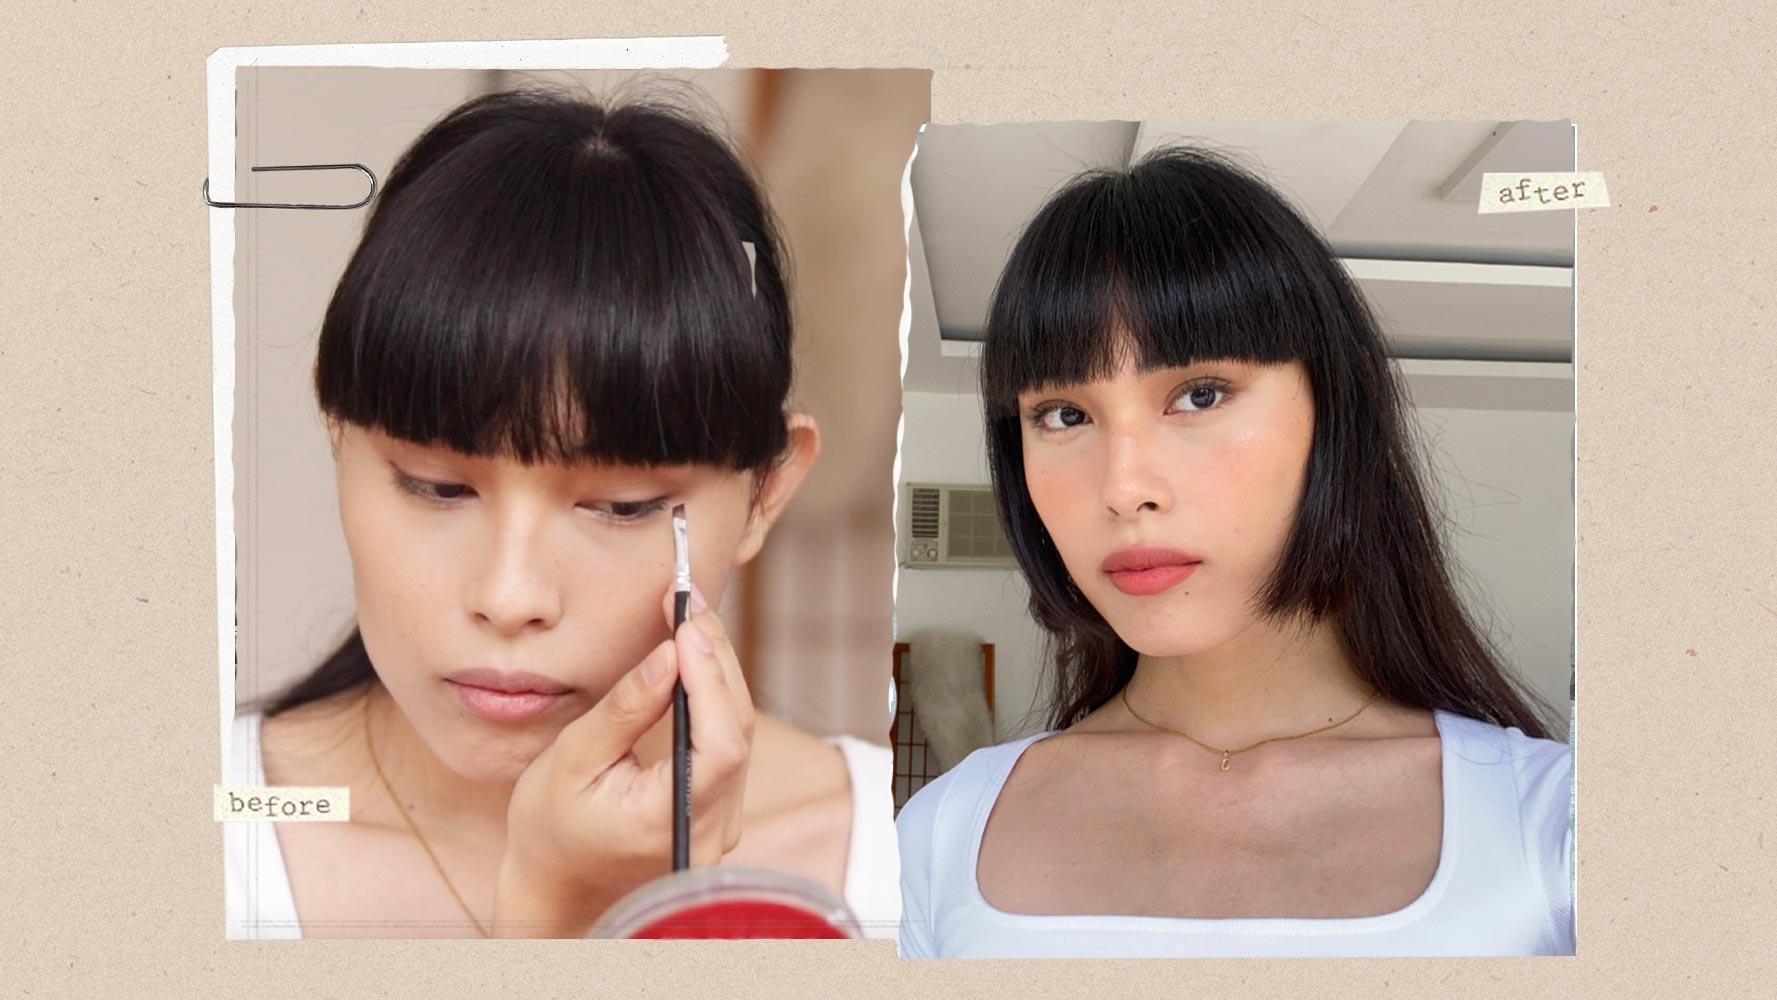 Here's How Tiktok Influencer Justine Llarena Does Her Go-to Errand Makeup Look